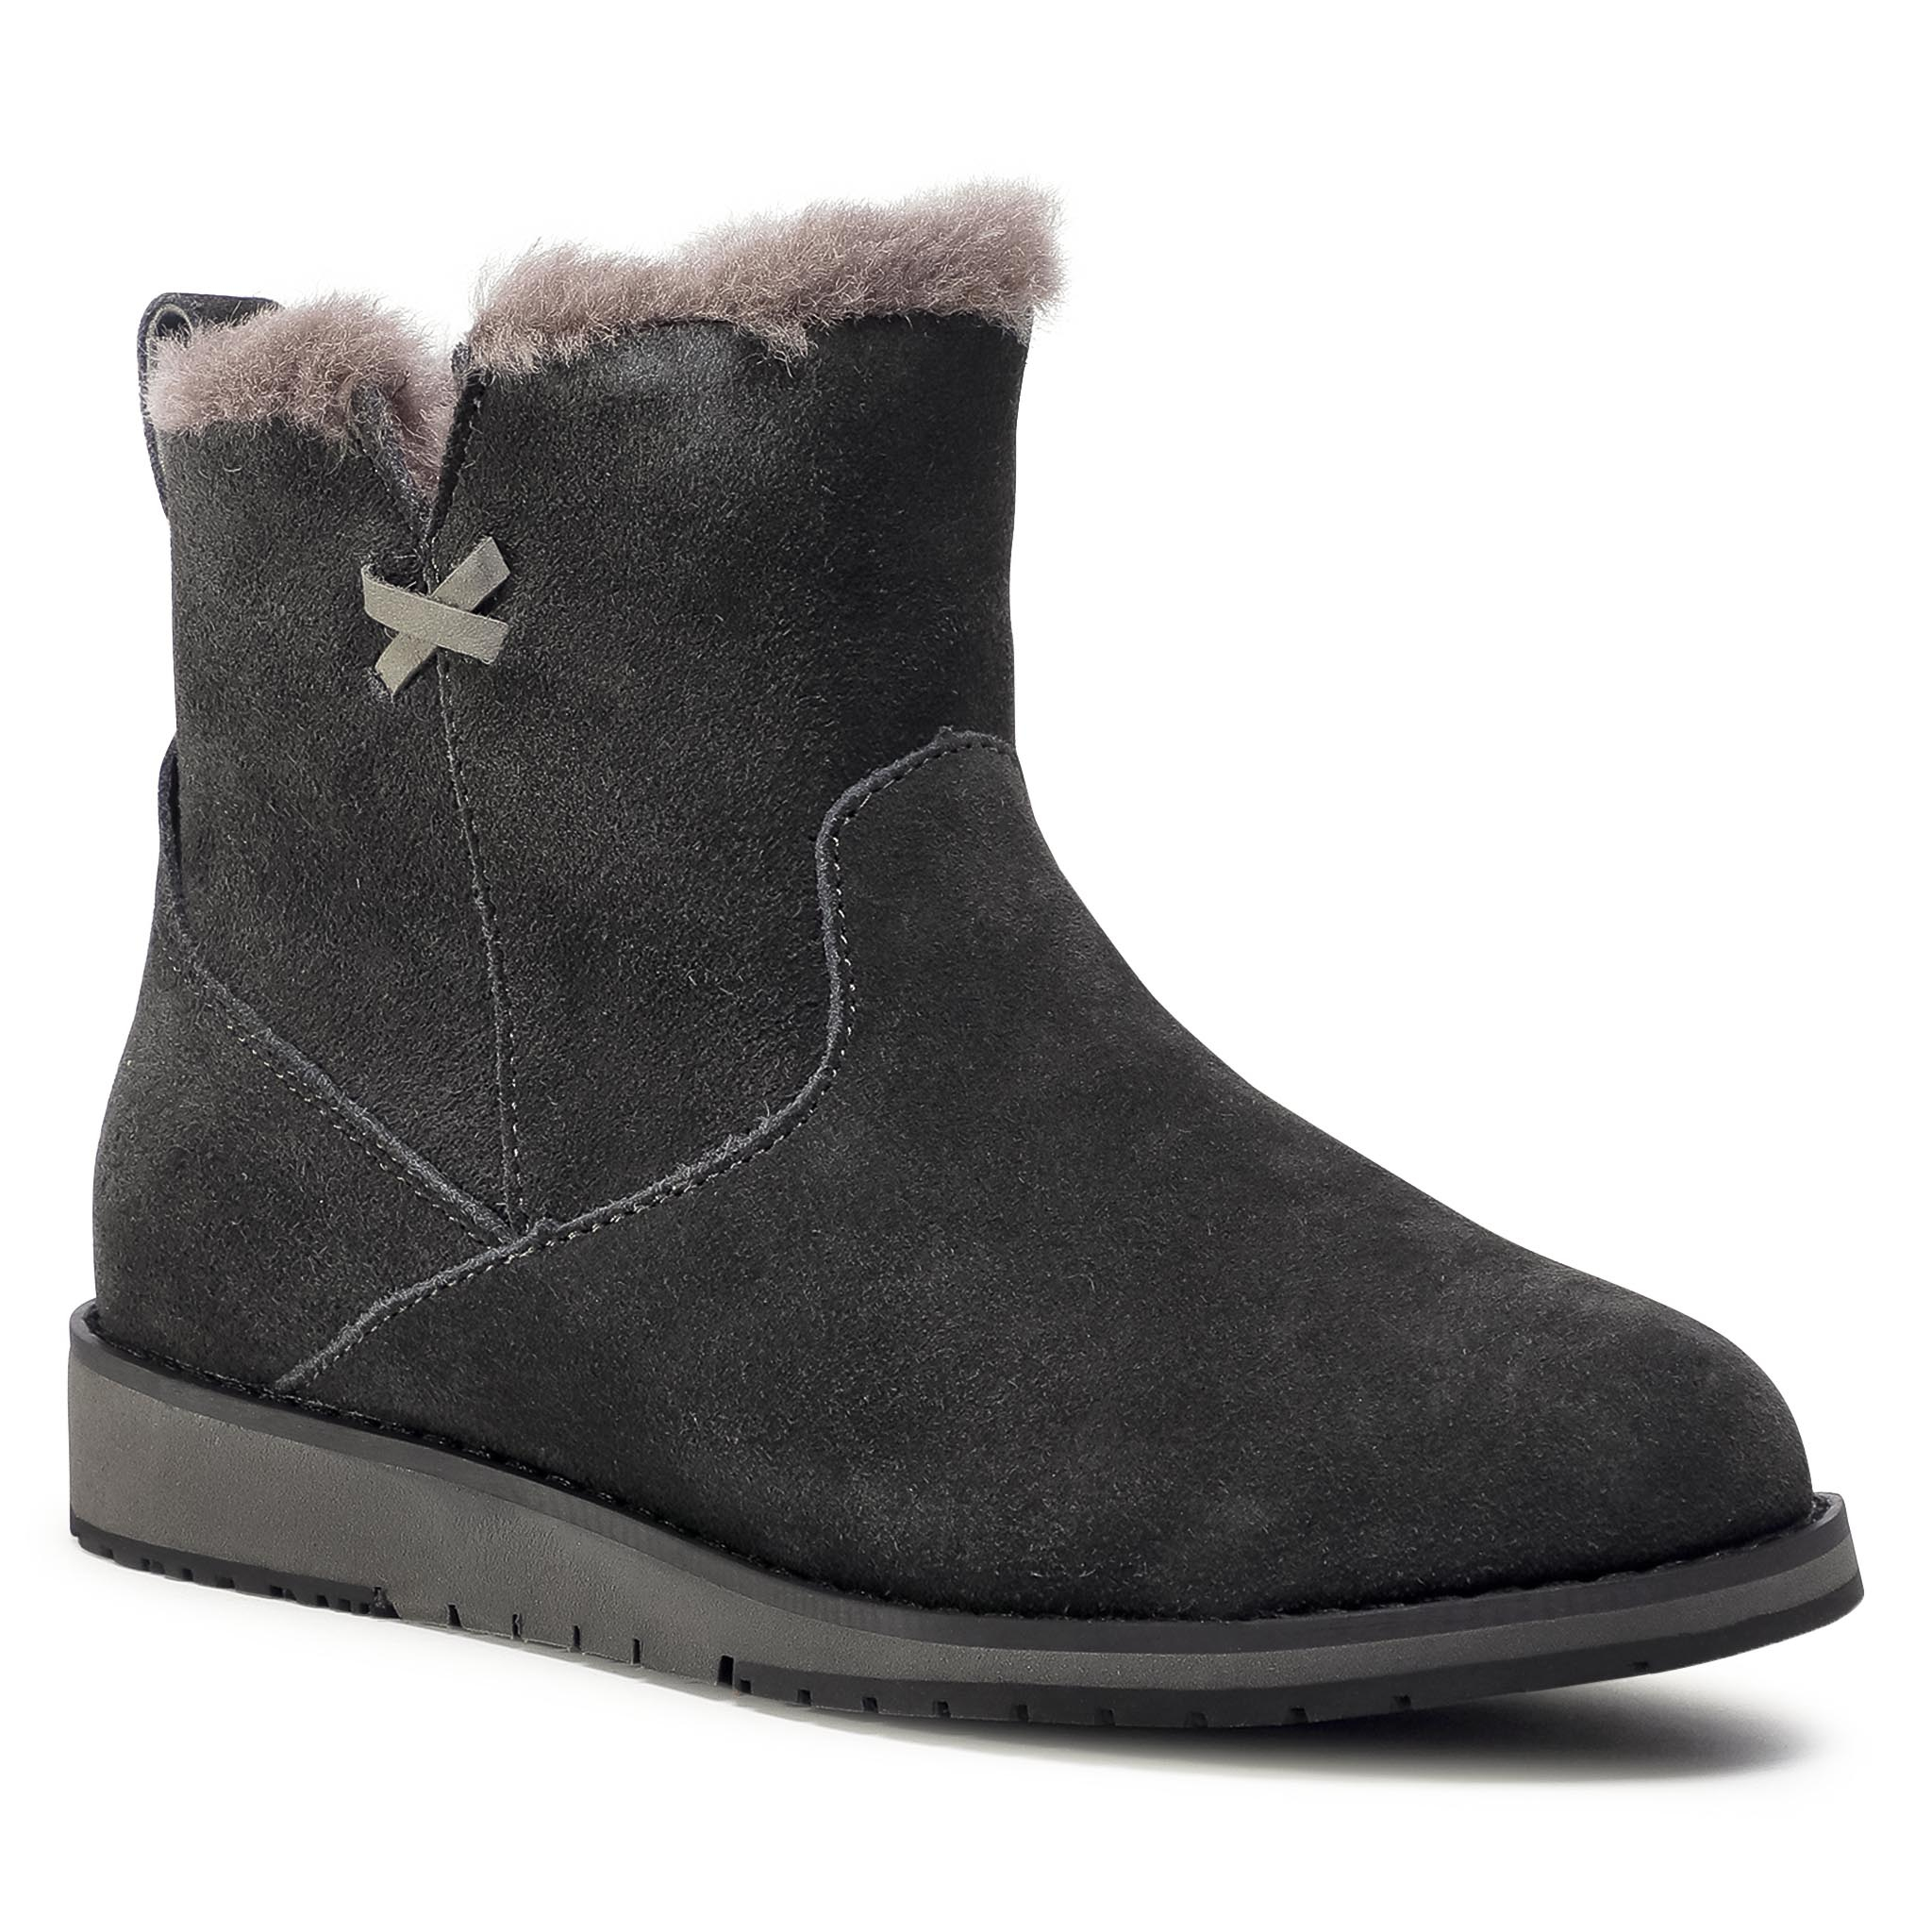 Image of Schuhe EMU AUSTRALIA - Beach Mini W11026 Dark Grey/Black